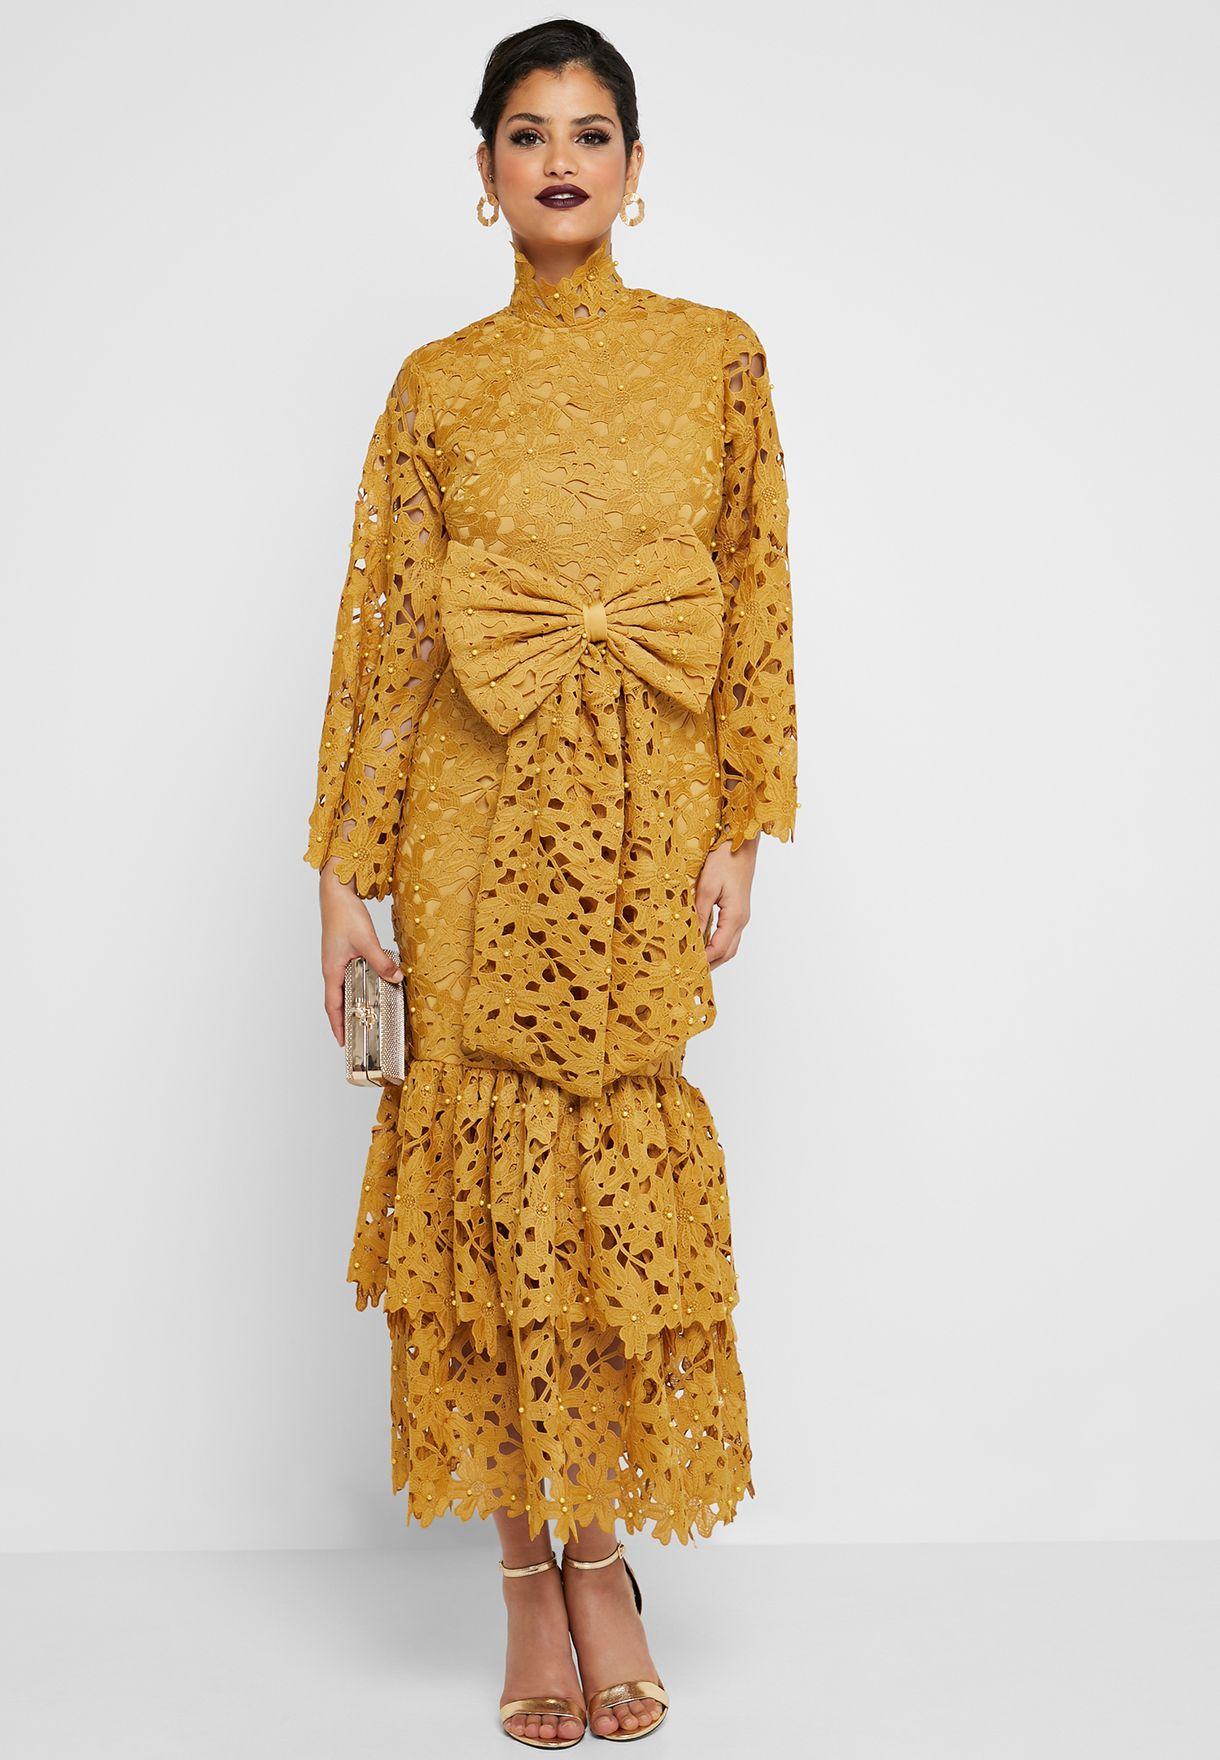 Bow Detail Tiered Crochet Dress